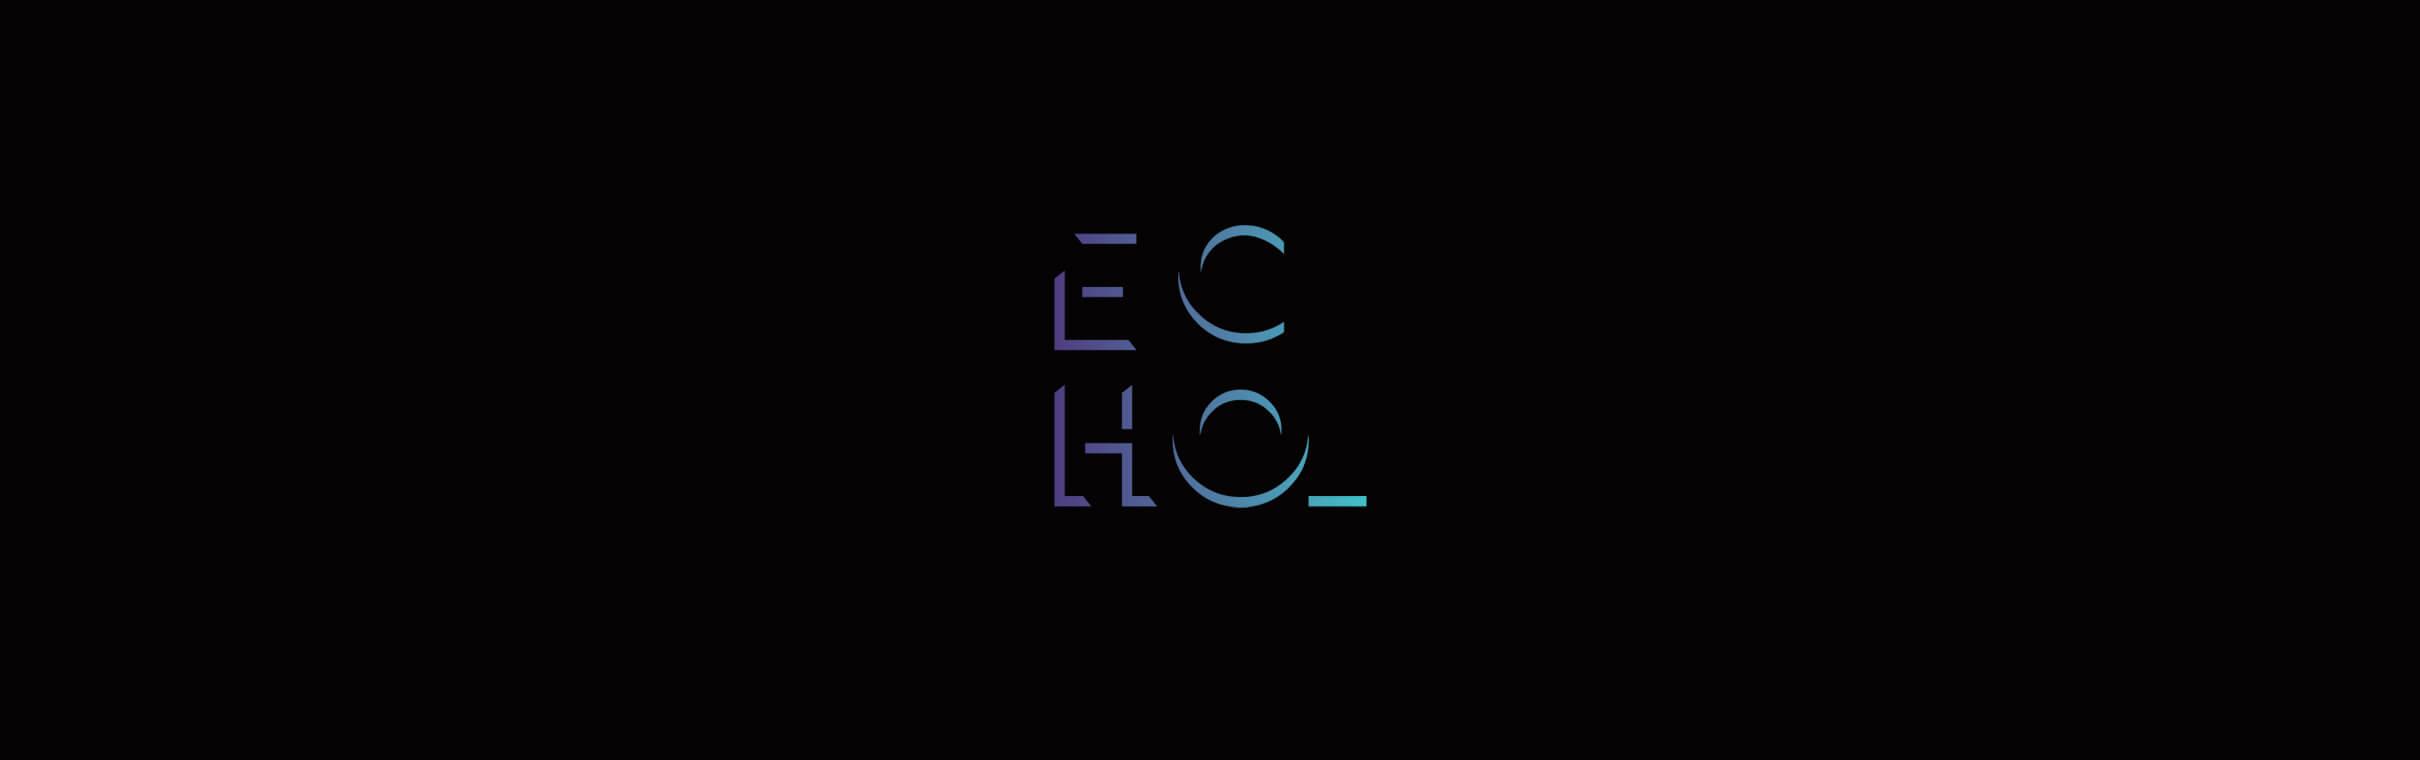 Echo_